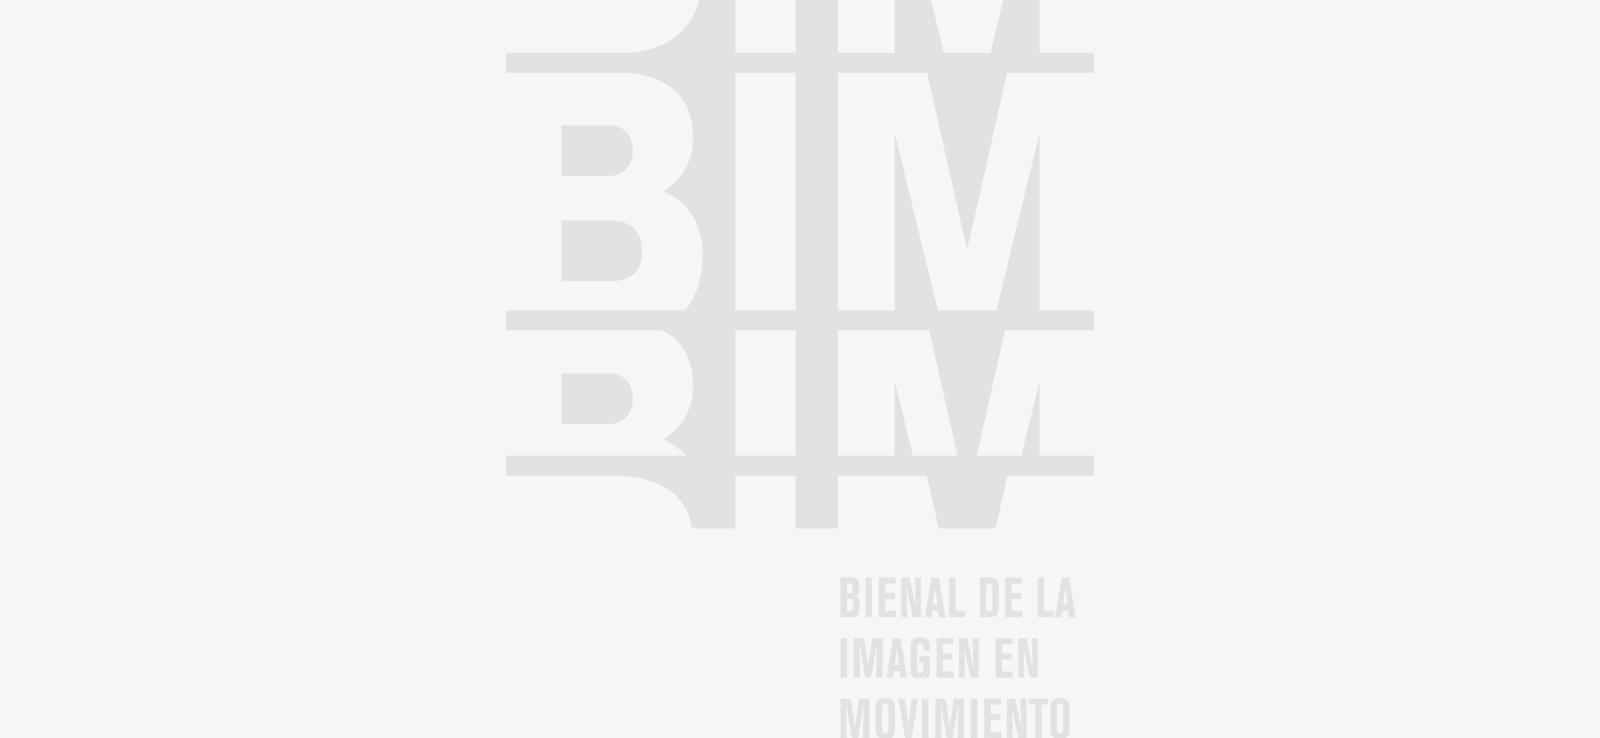 Antoni-Pinent-film-curator-BIM-Bienal-Imagen-Movimiento-program